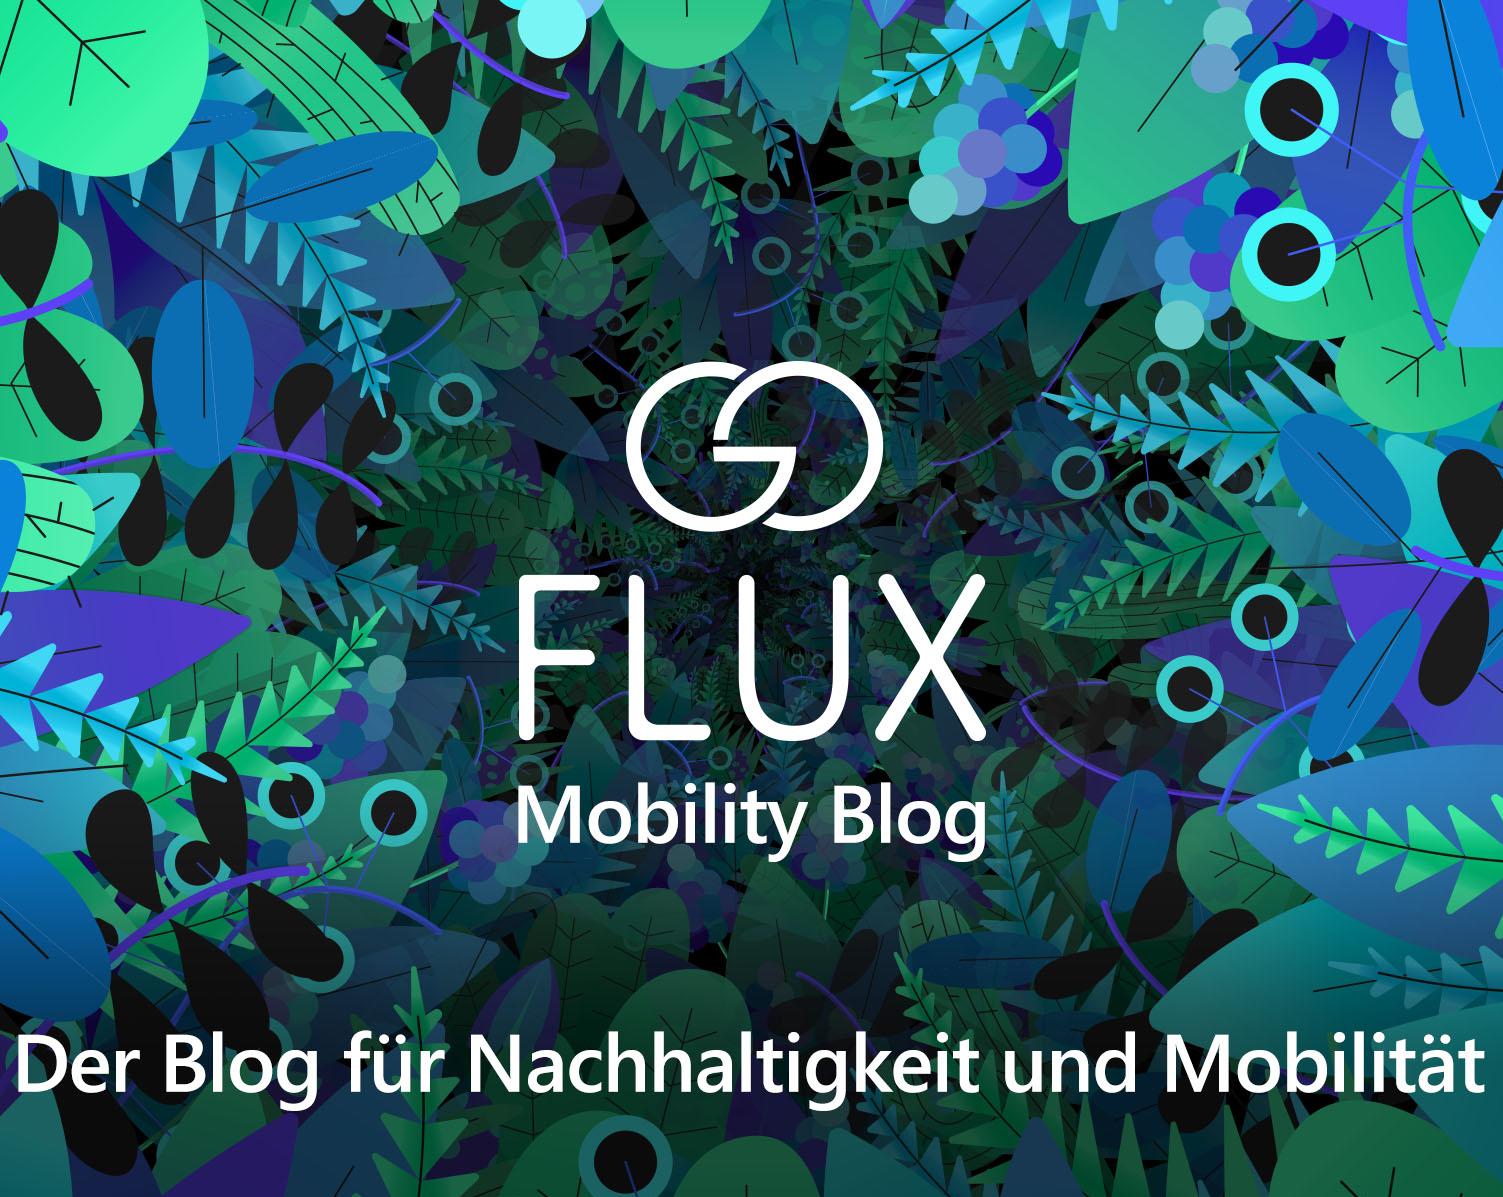 goFLUX_Blog_1500x1200